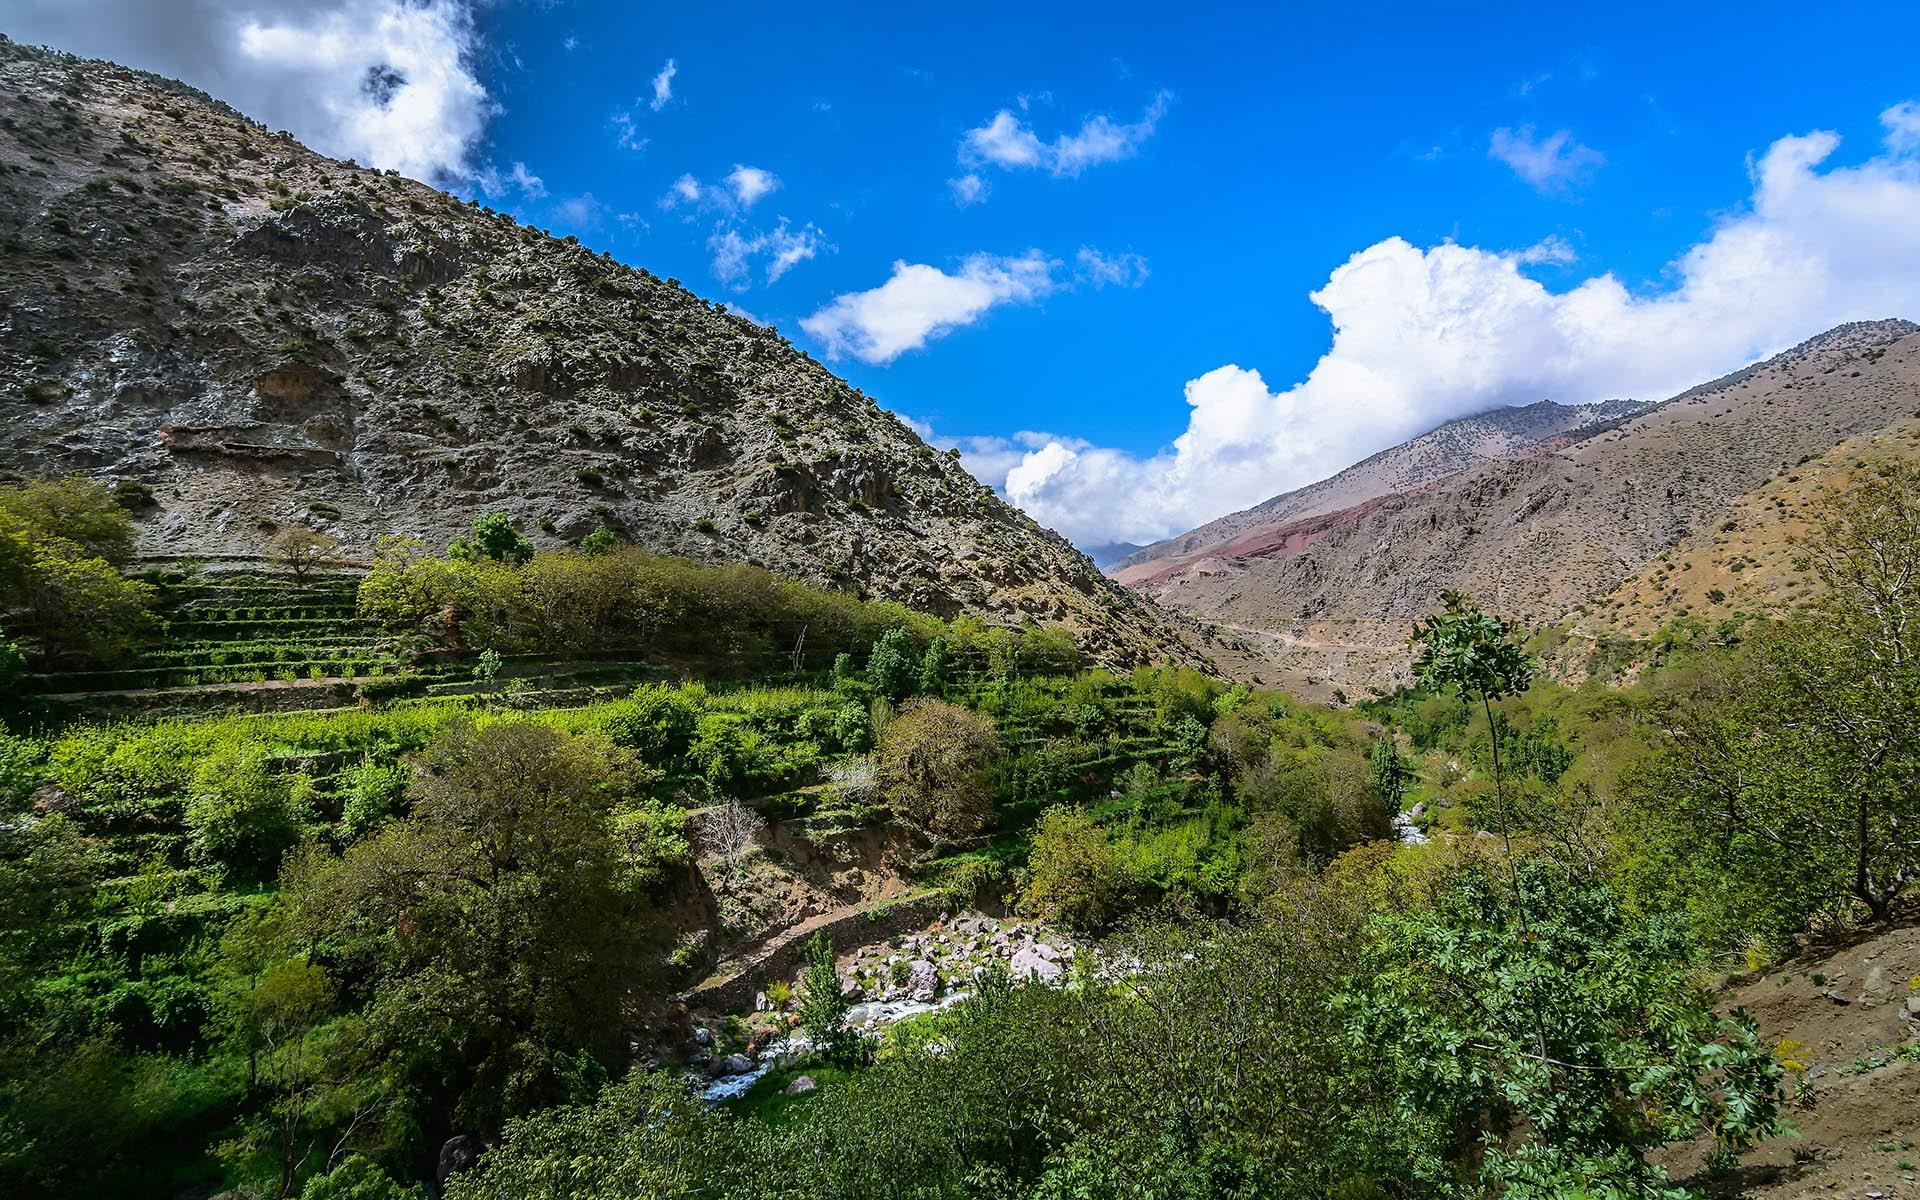 Active Treks Morocco - Berber Villages of Ouirgane